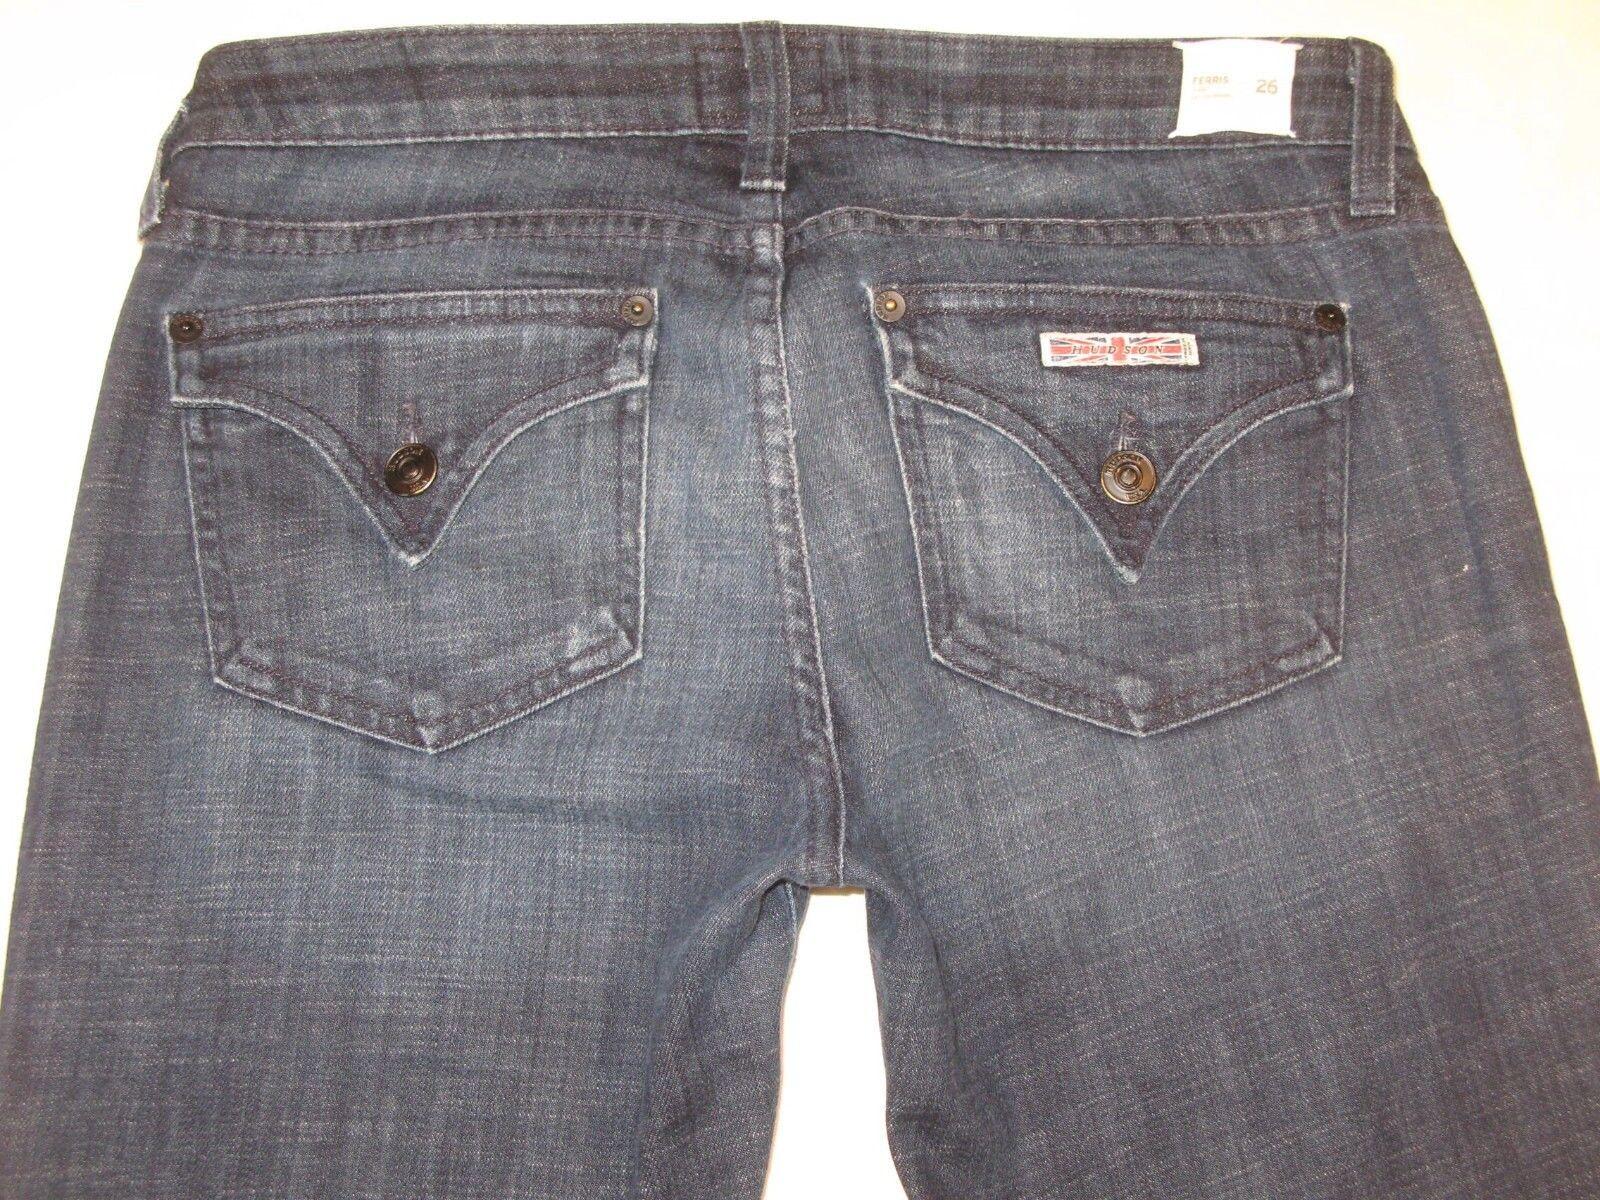 Hudson Ferris Flare Jeans Sz 26 Dark Distressed w Stretch Low Rise Flap Pocs